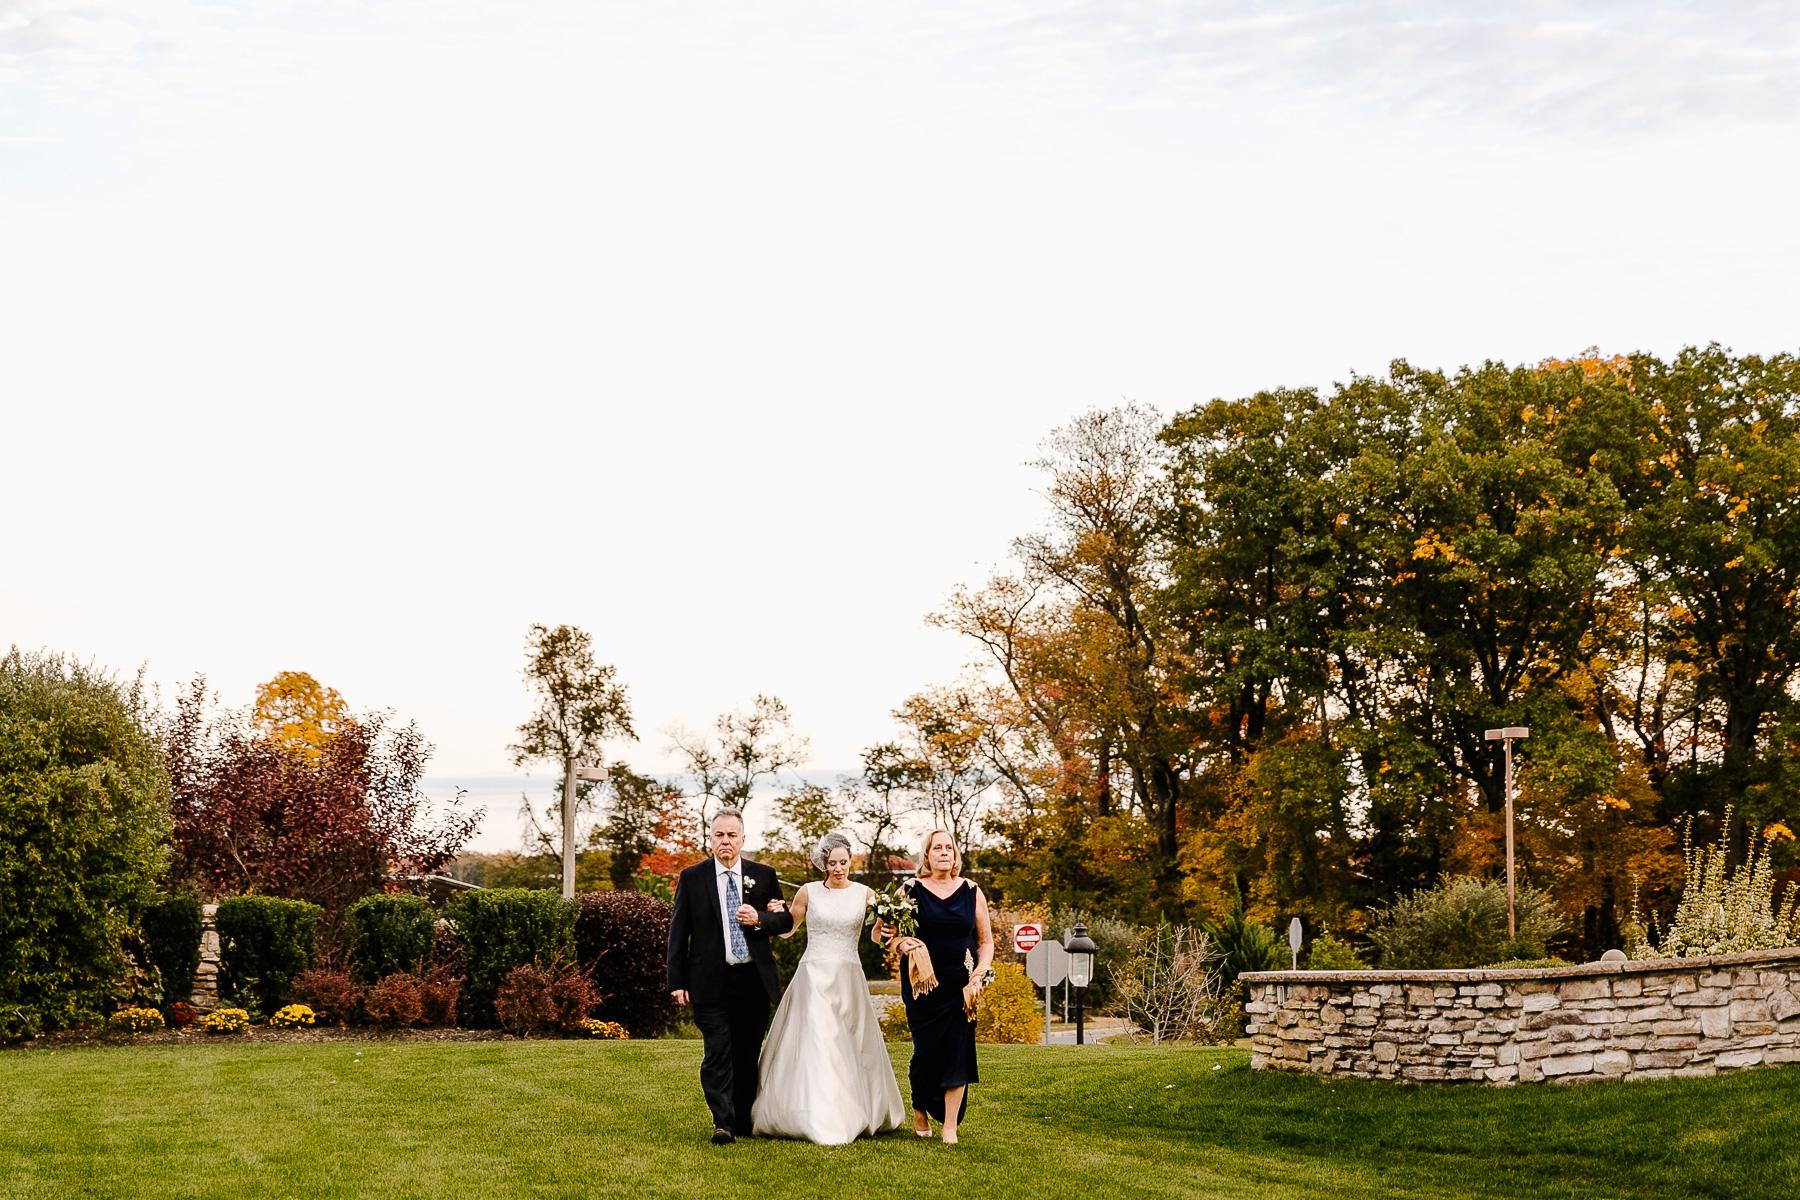 75-Laurita Winery Wedding New Jersey Wedding Photographer Laurita Winery Weddings Longbrook Photography.jpg